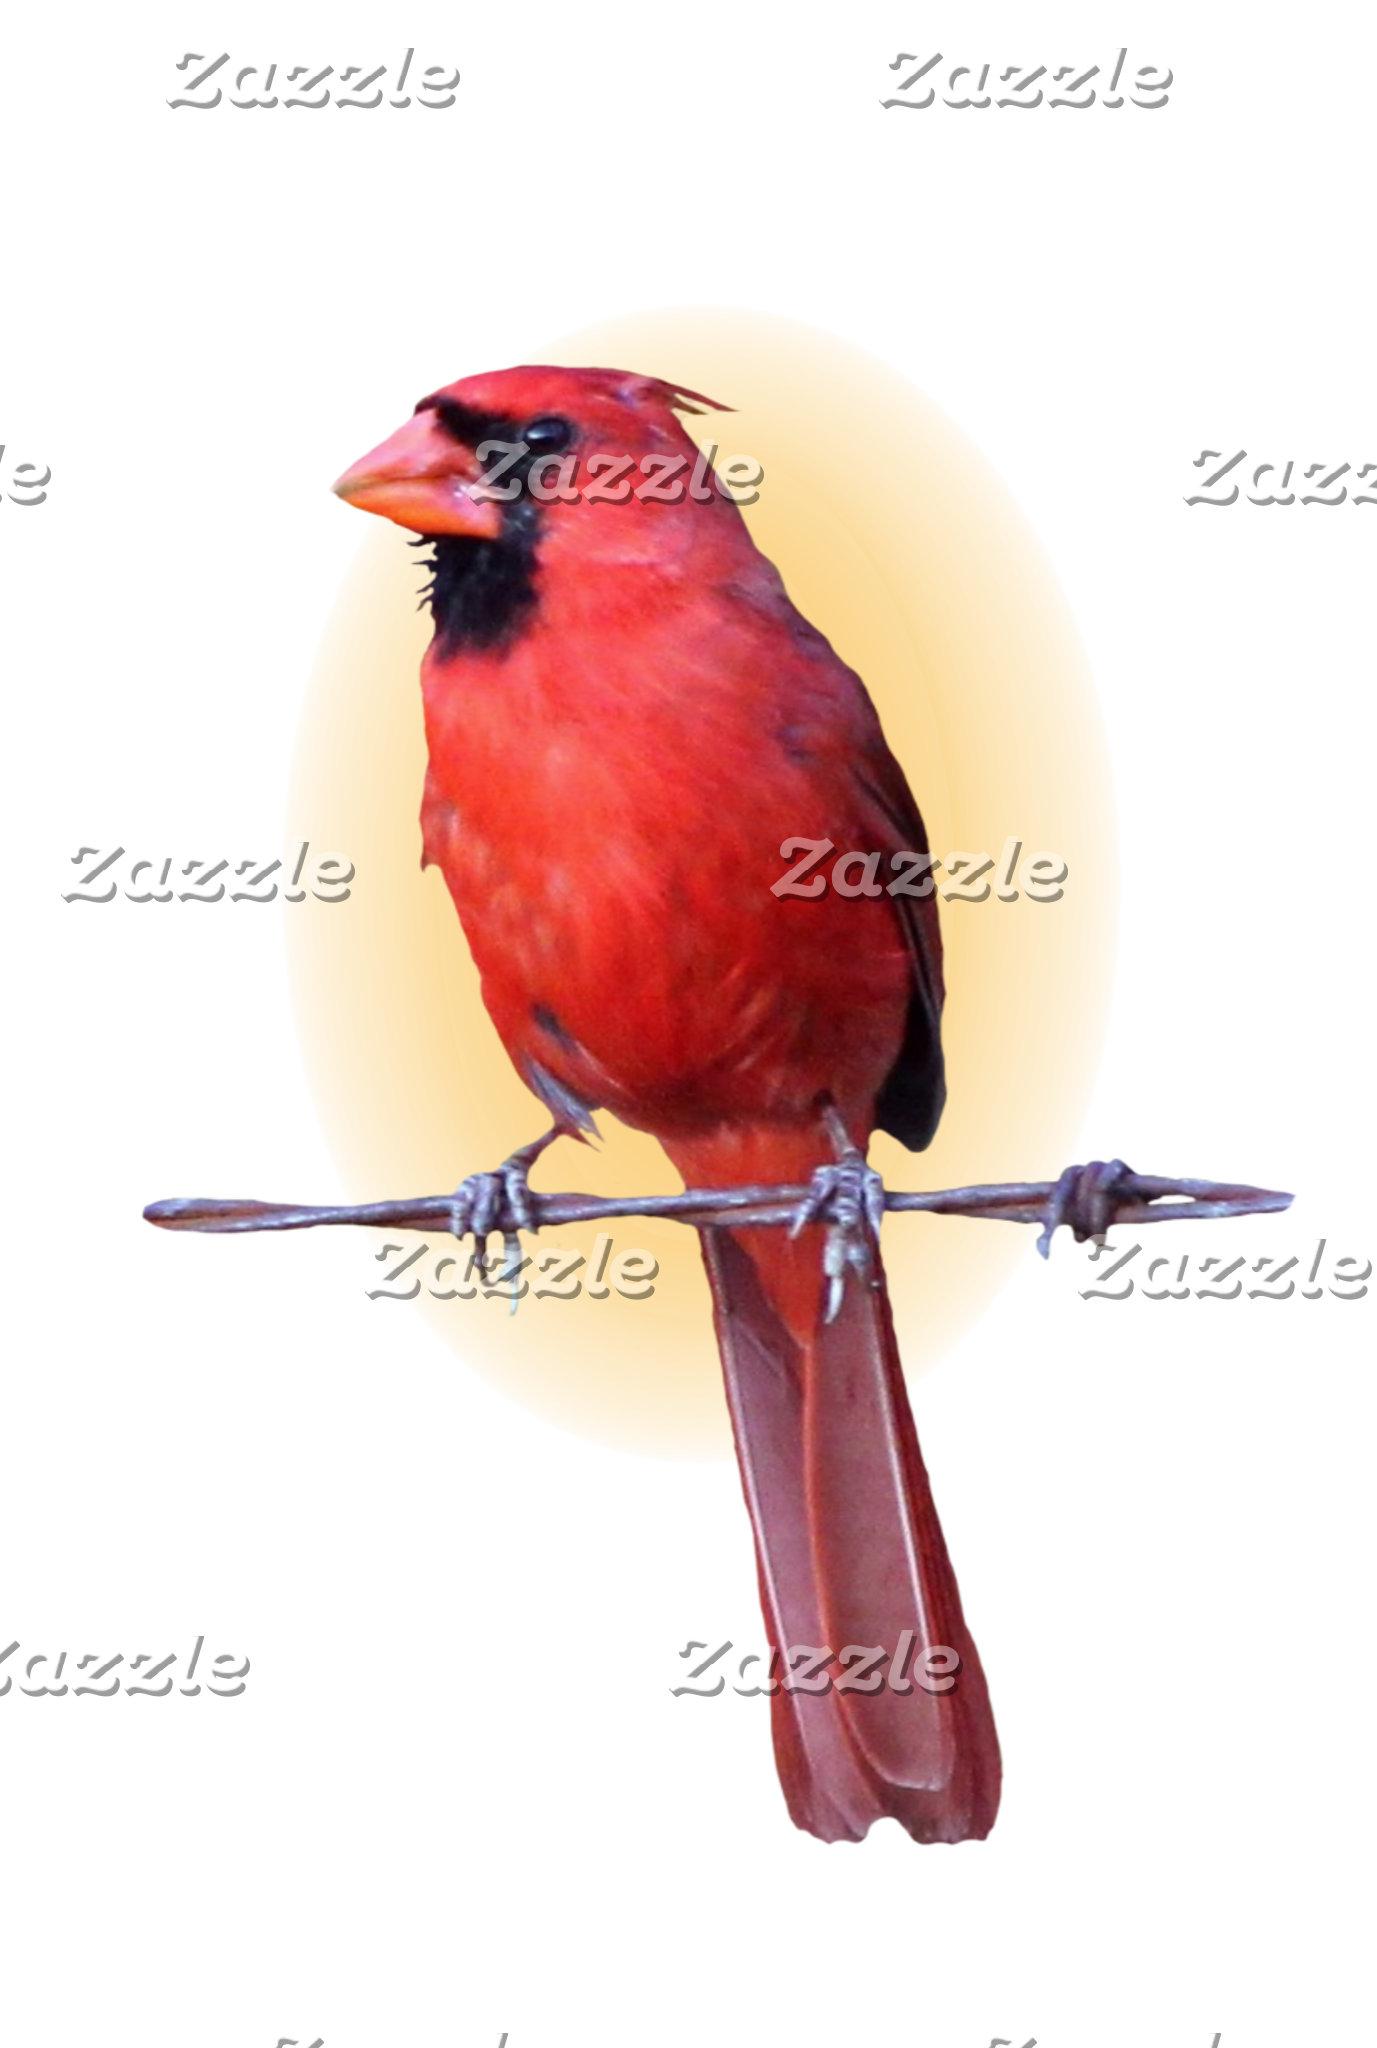 BIRDS AND DUCKS